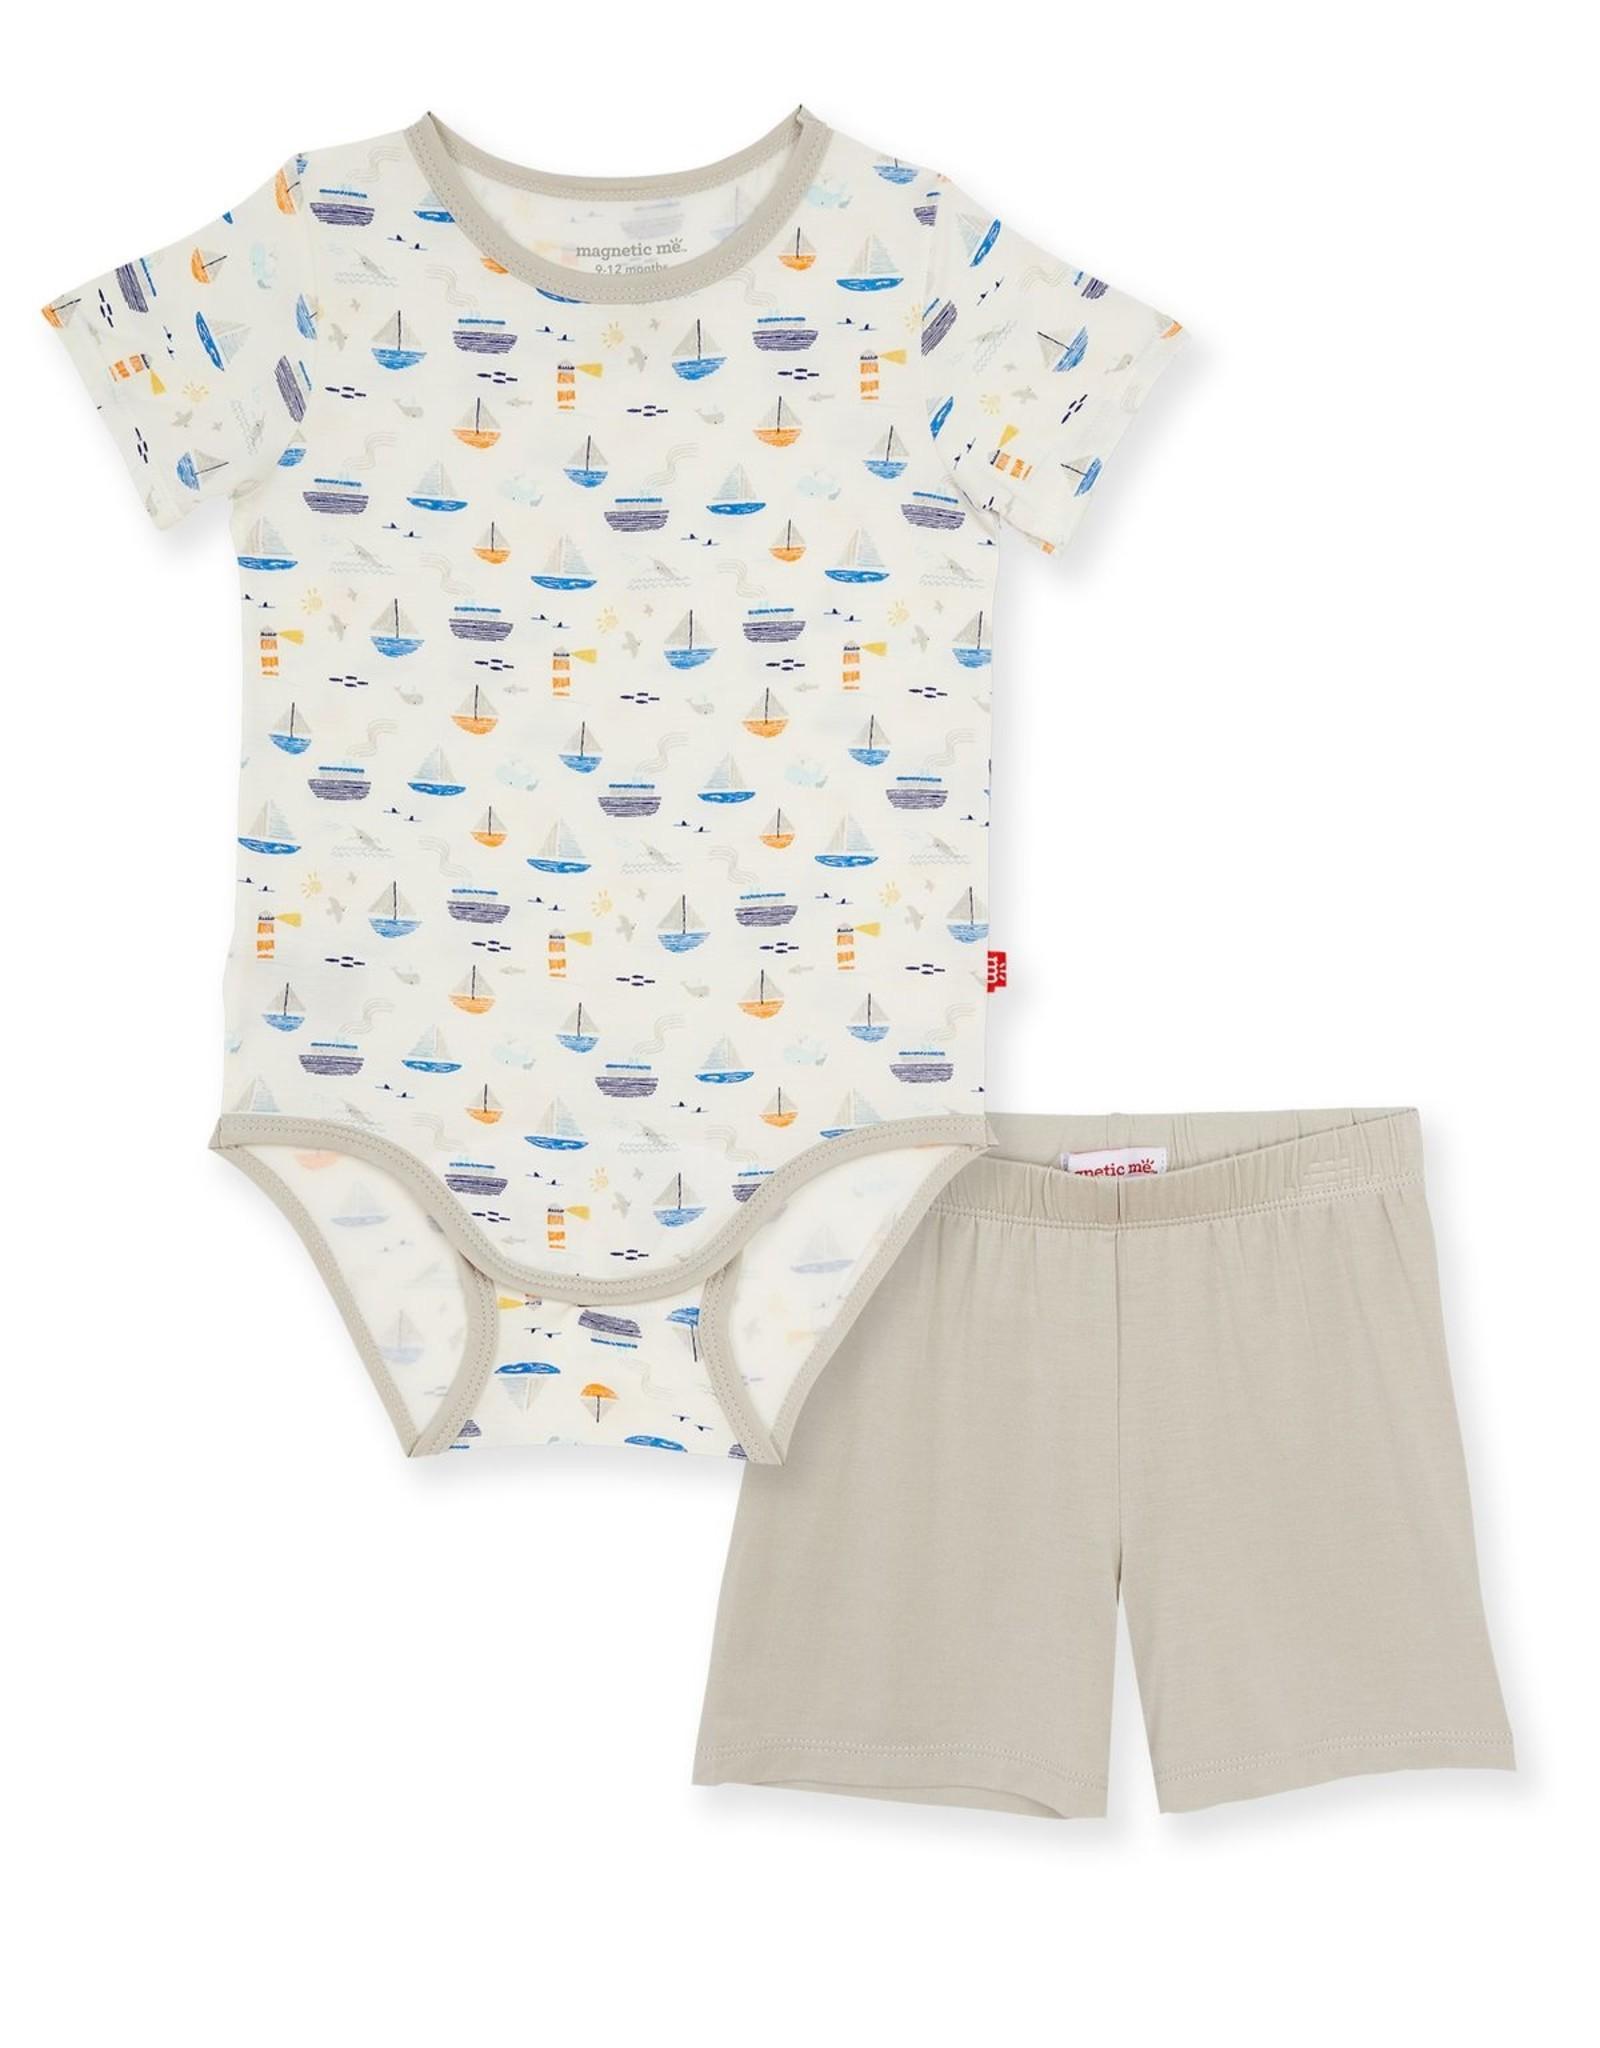 Magnetic Me Monterey Bay Modal Bodysuit & Short Set